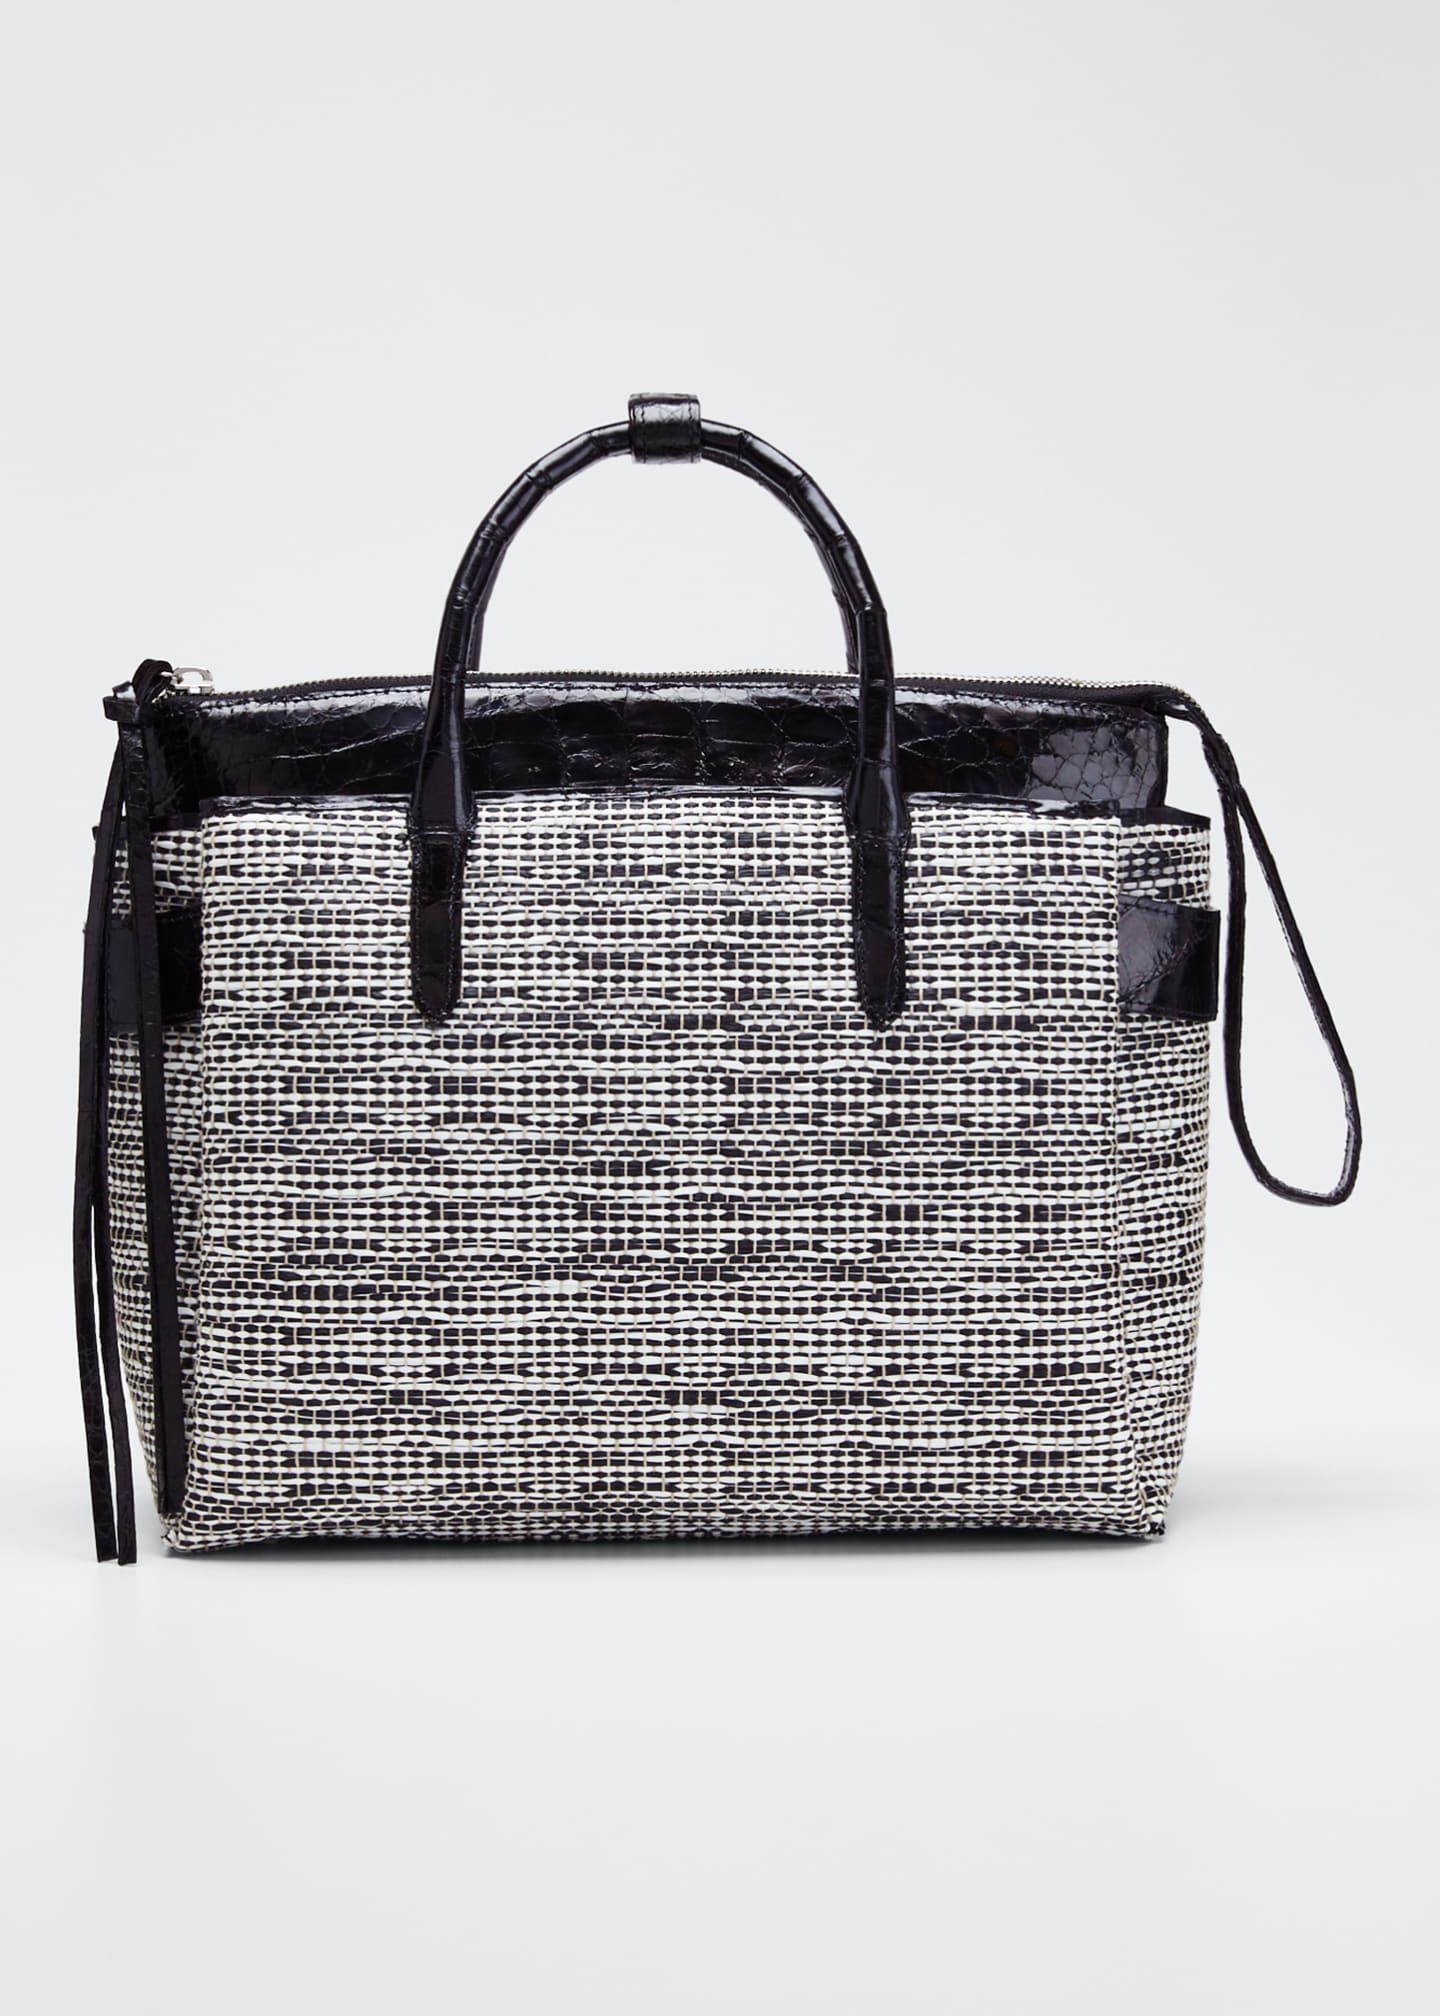 Nancy Gonzalez Cristie Medium Linen Crocodile Tote Bag